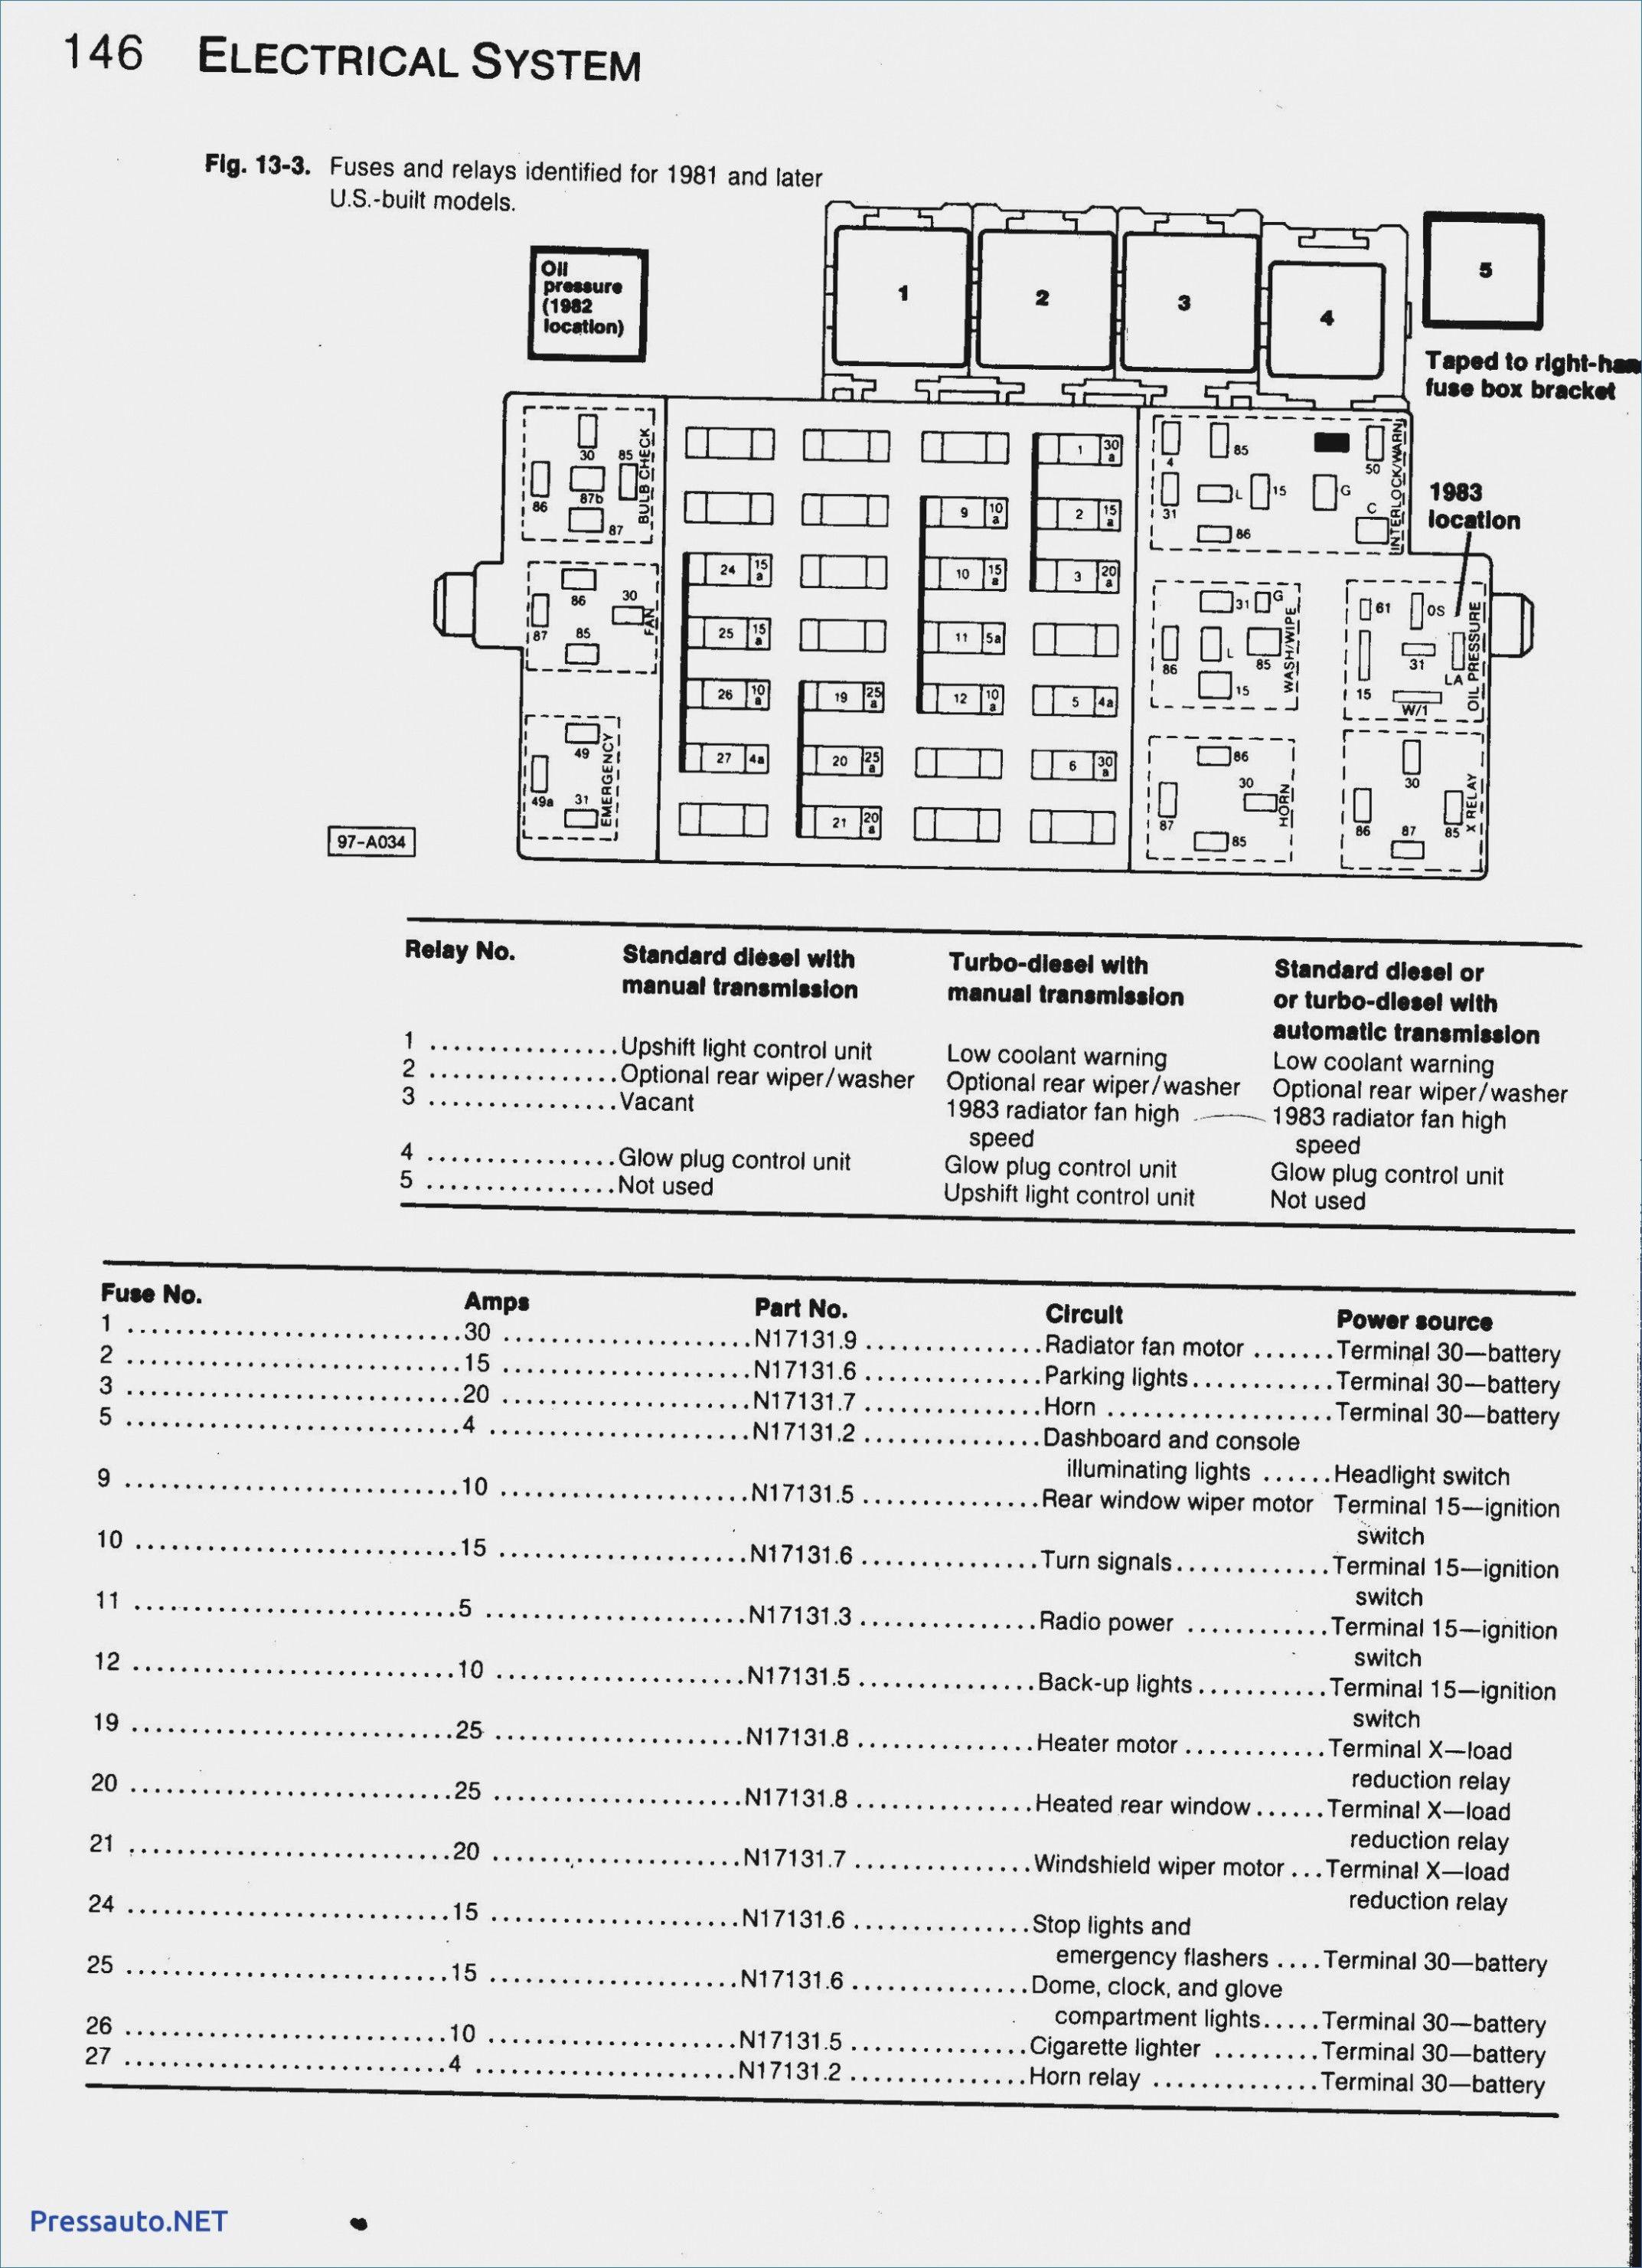 Fuse Box Diagram 2011 Vw Jetta Fuse Box Vw Jetta Diagram